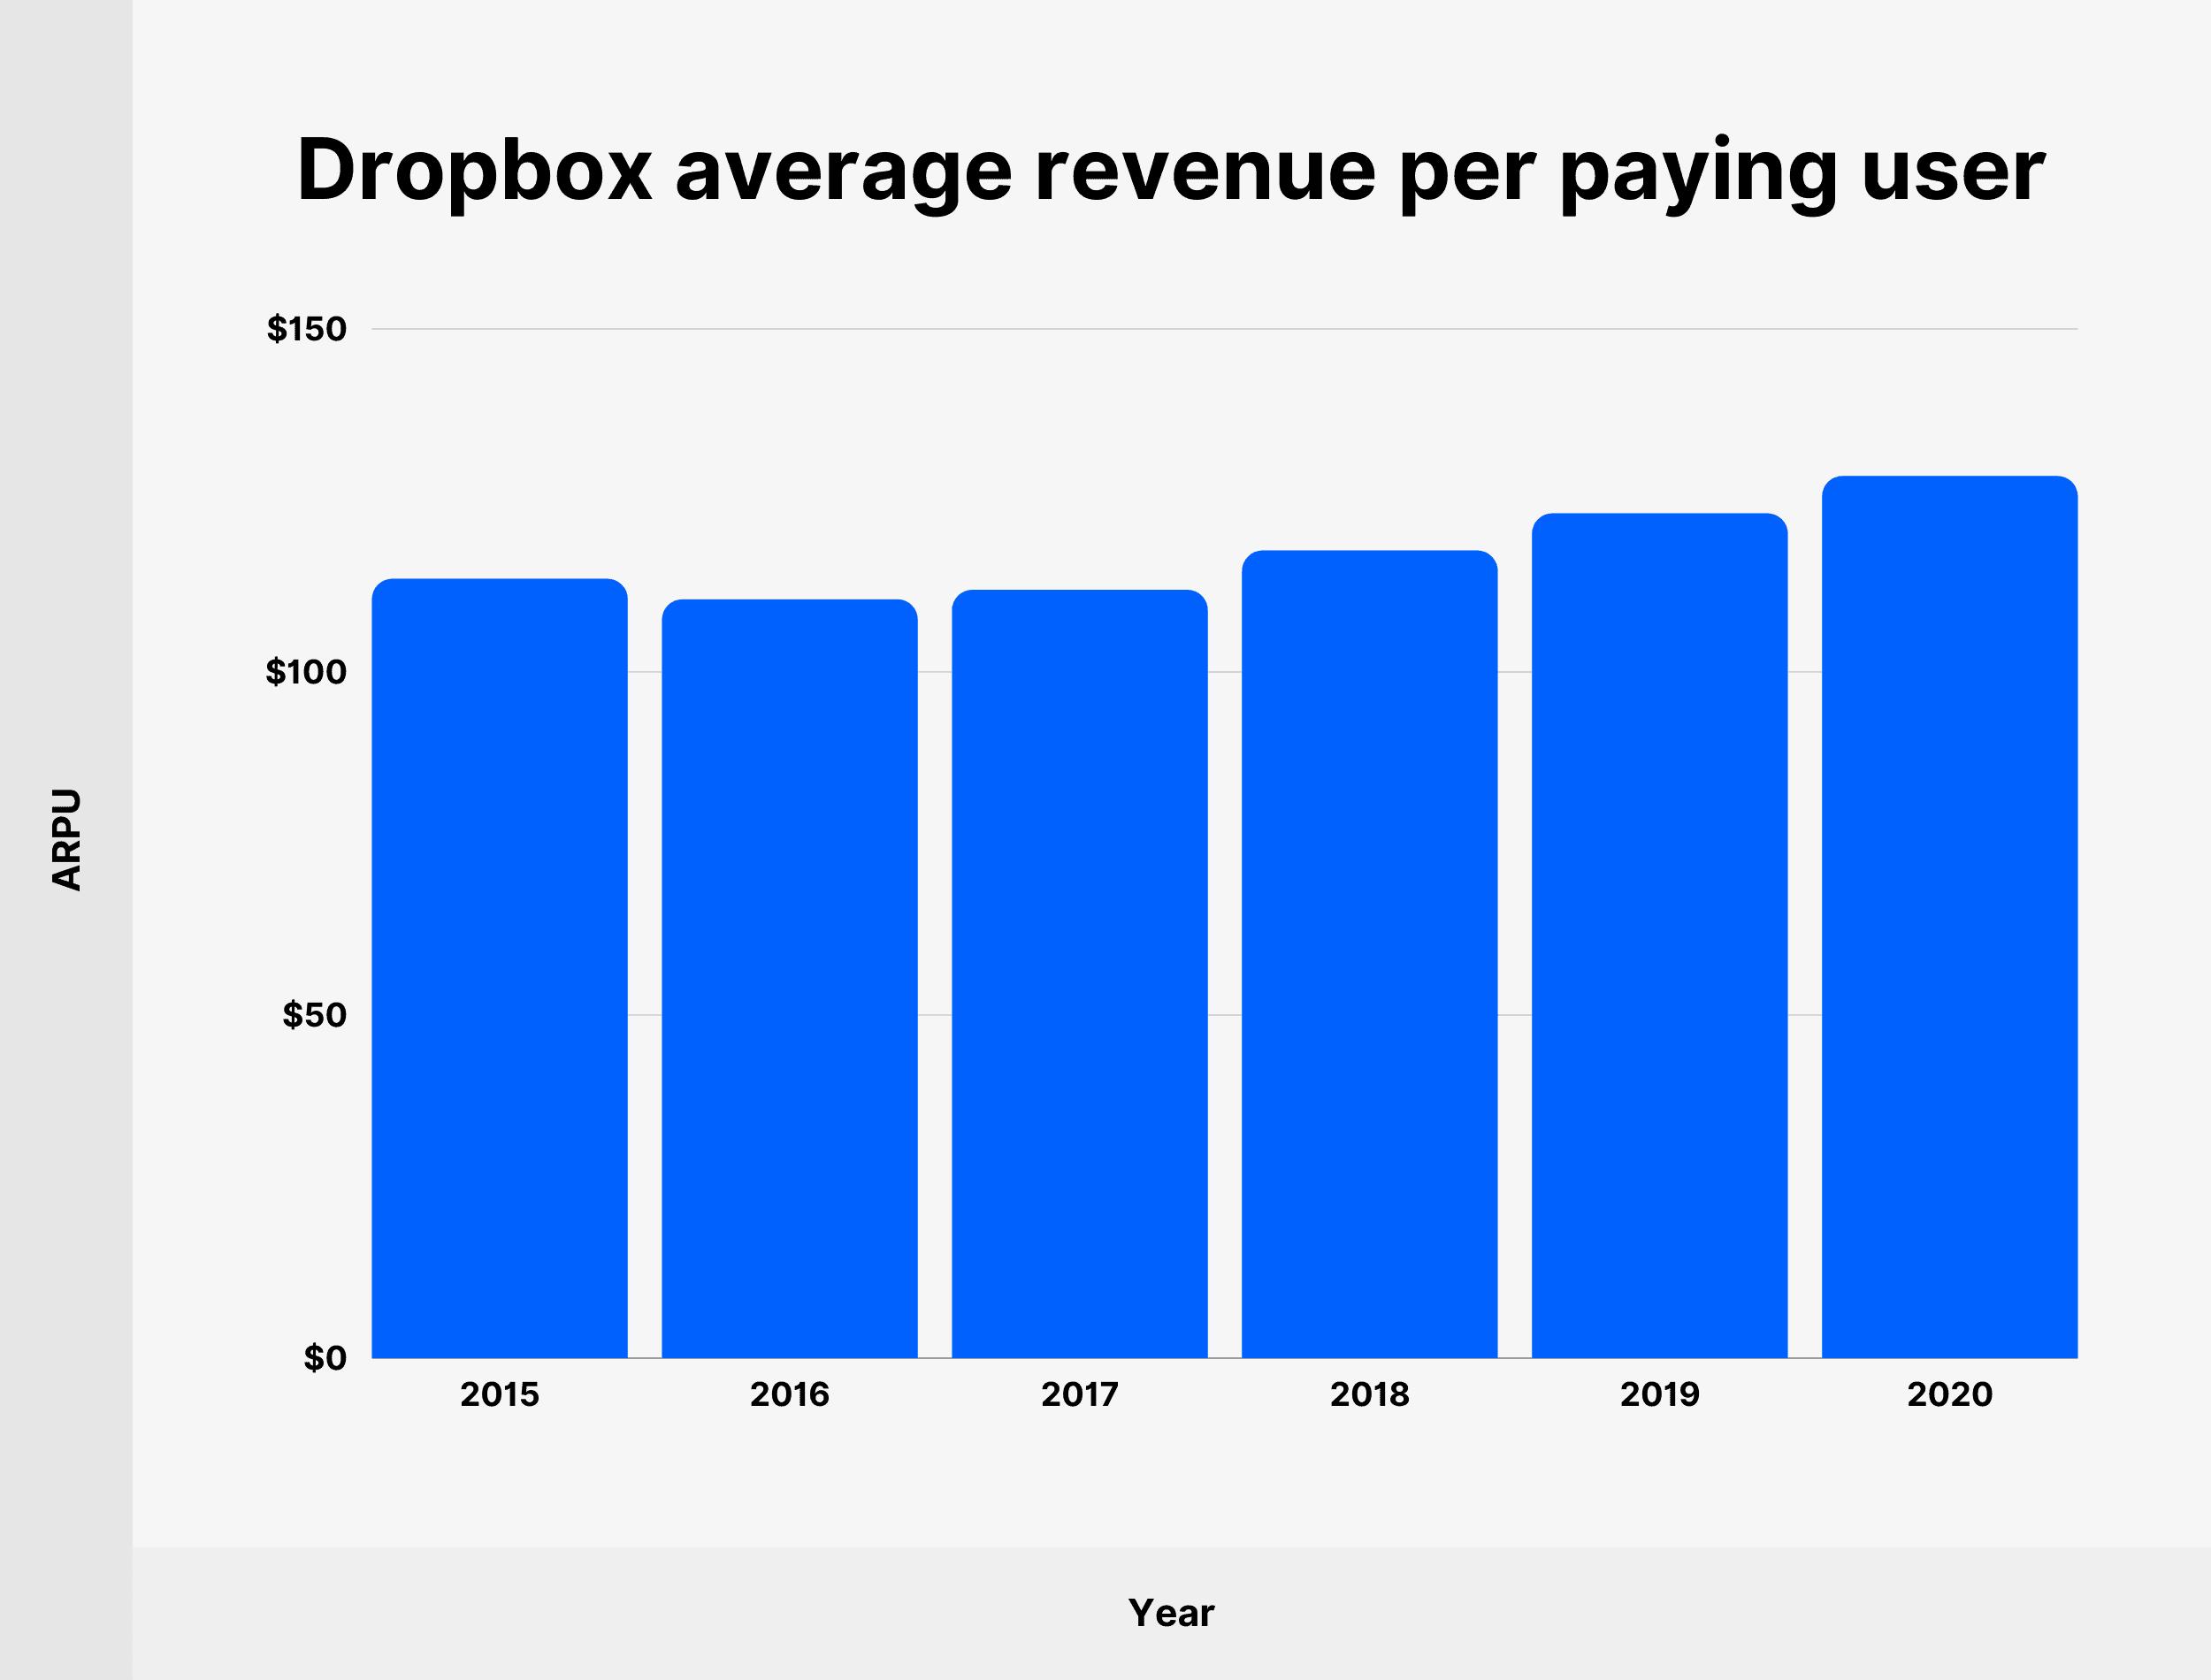 Dropbox average revenue per paying user